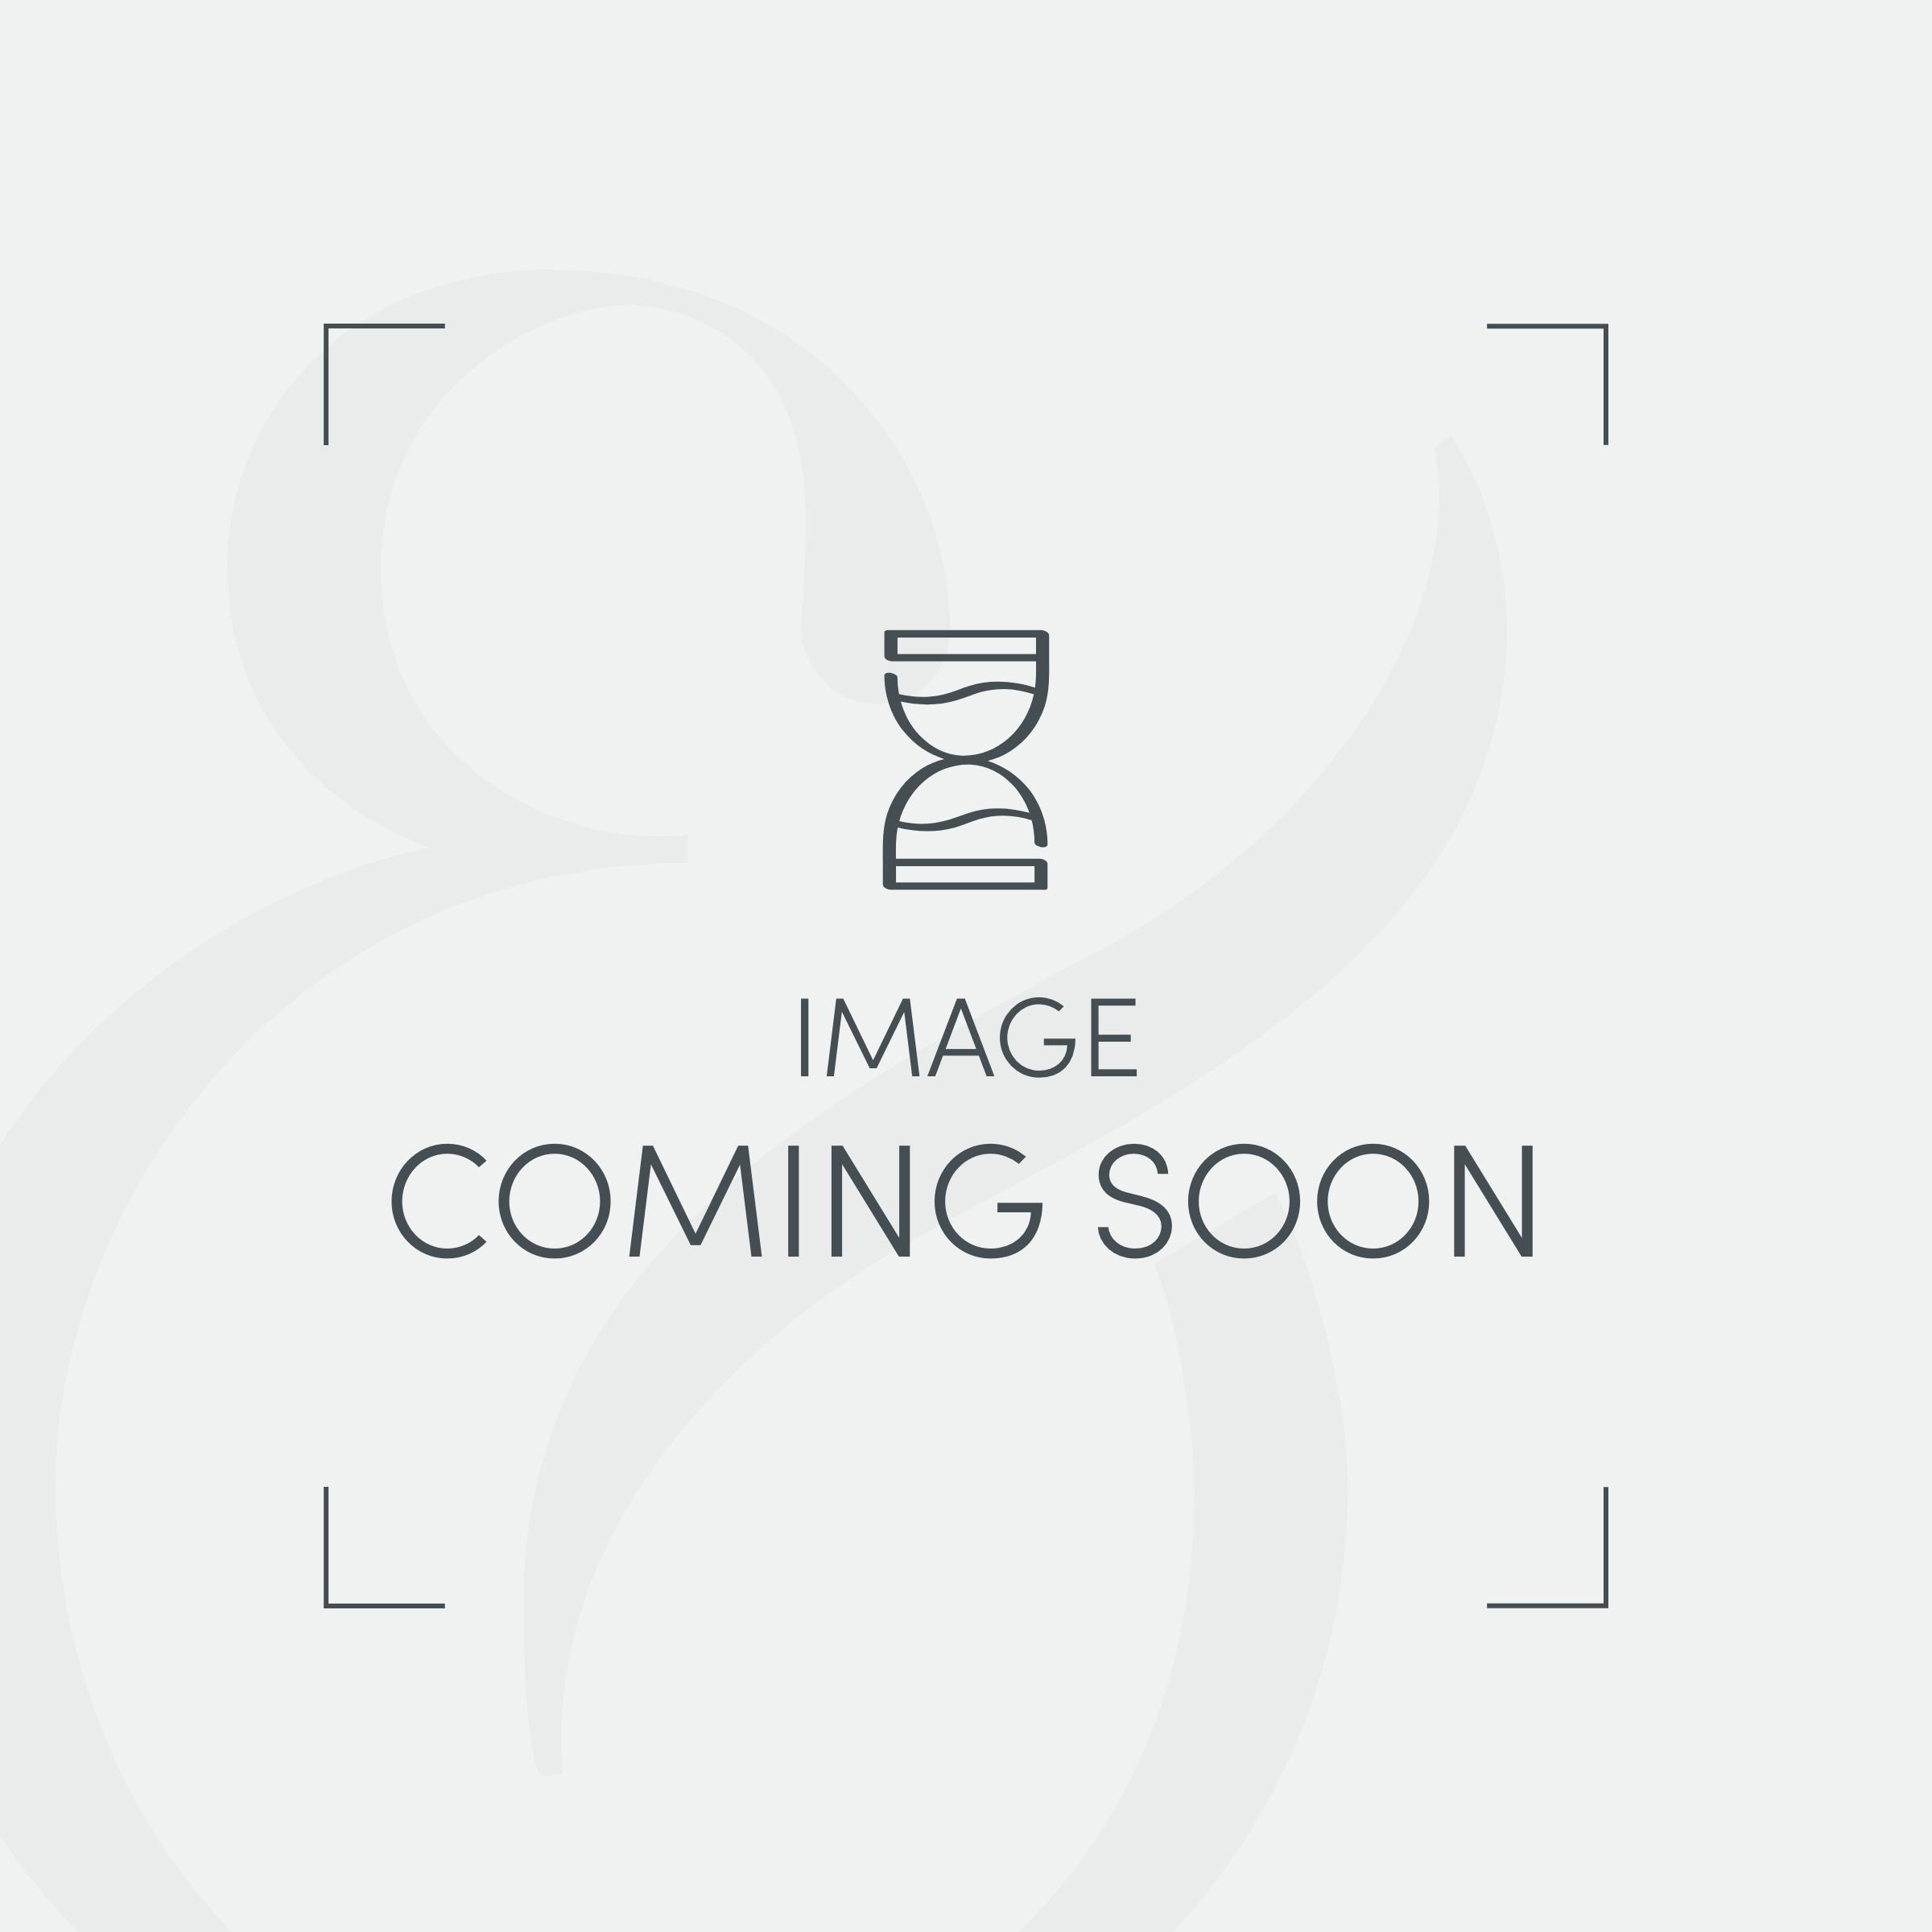 700GSM Luxury Egyptian Cotton Towels *SALE COLOURS*